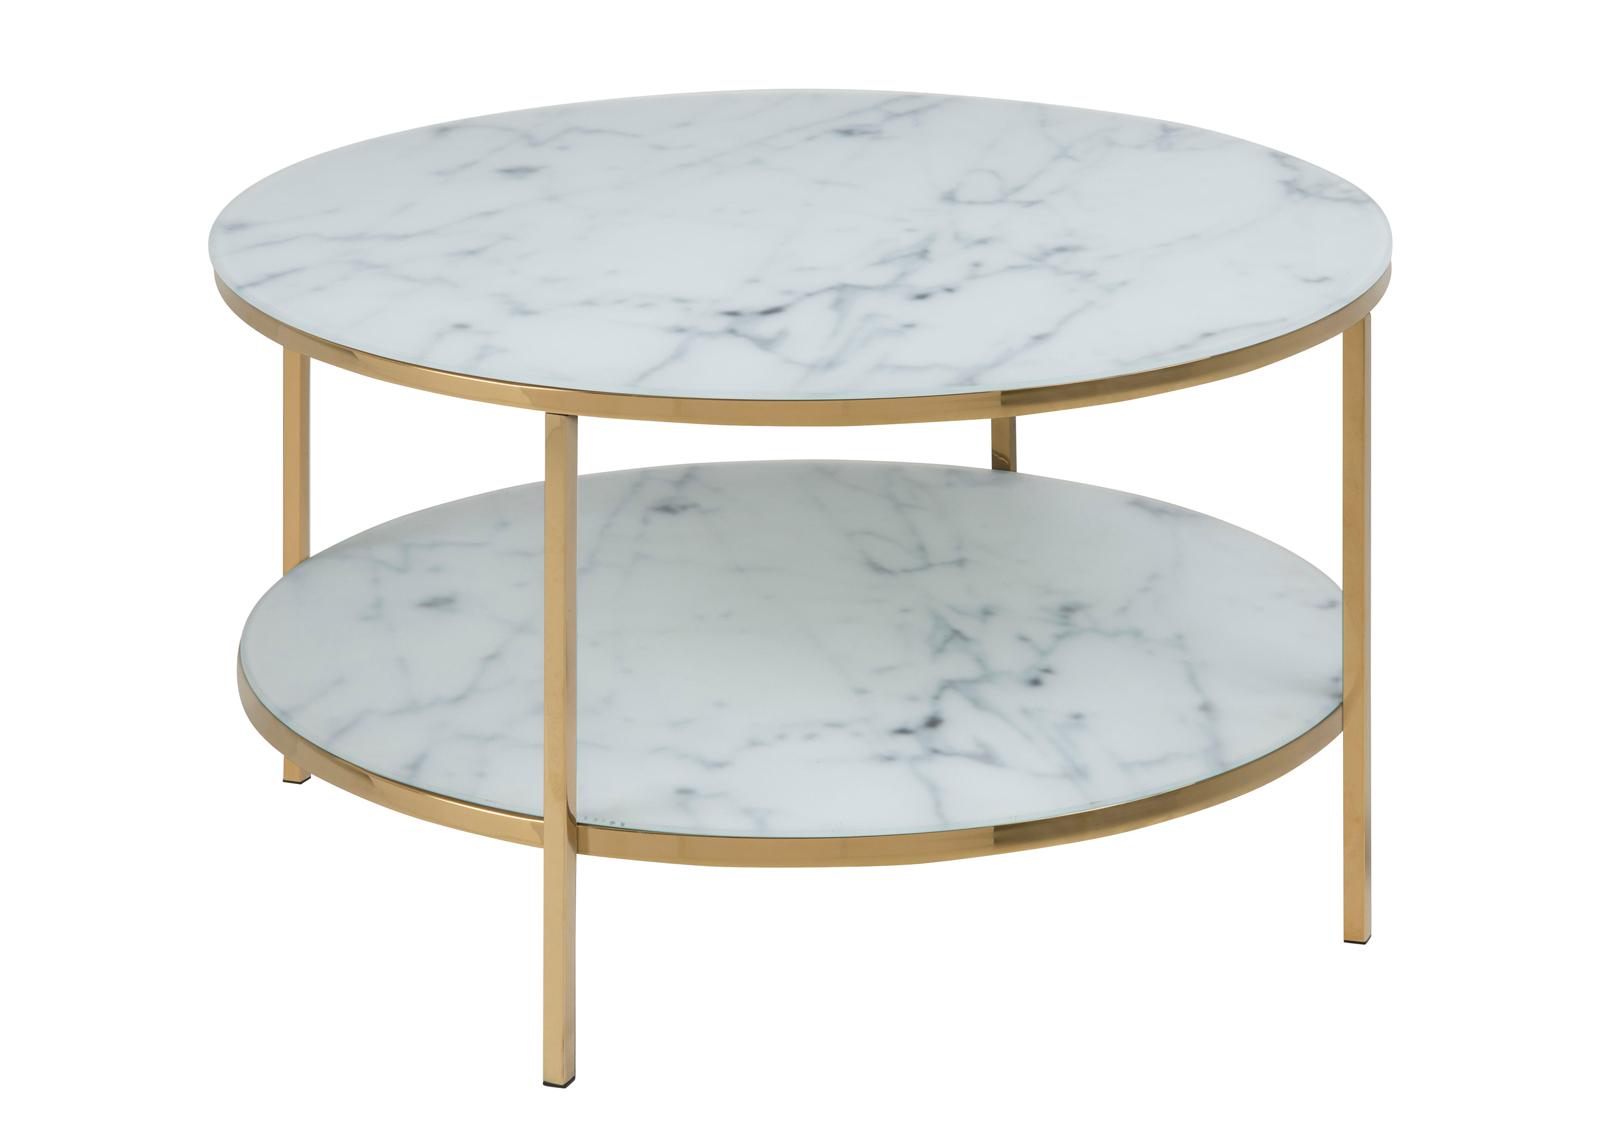 Sohvapöytä Alisma Ø 80 cm